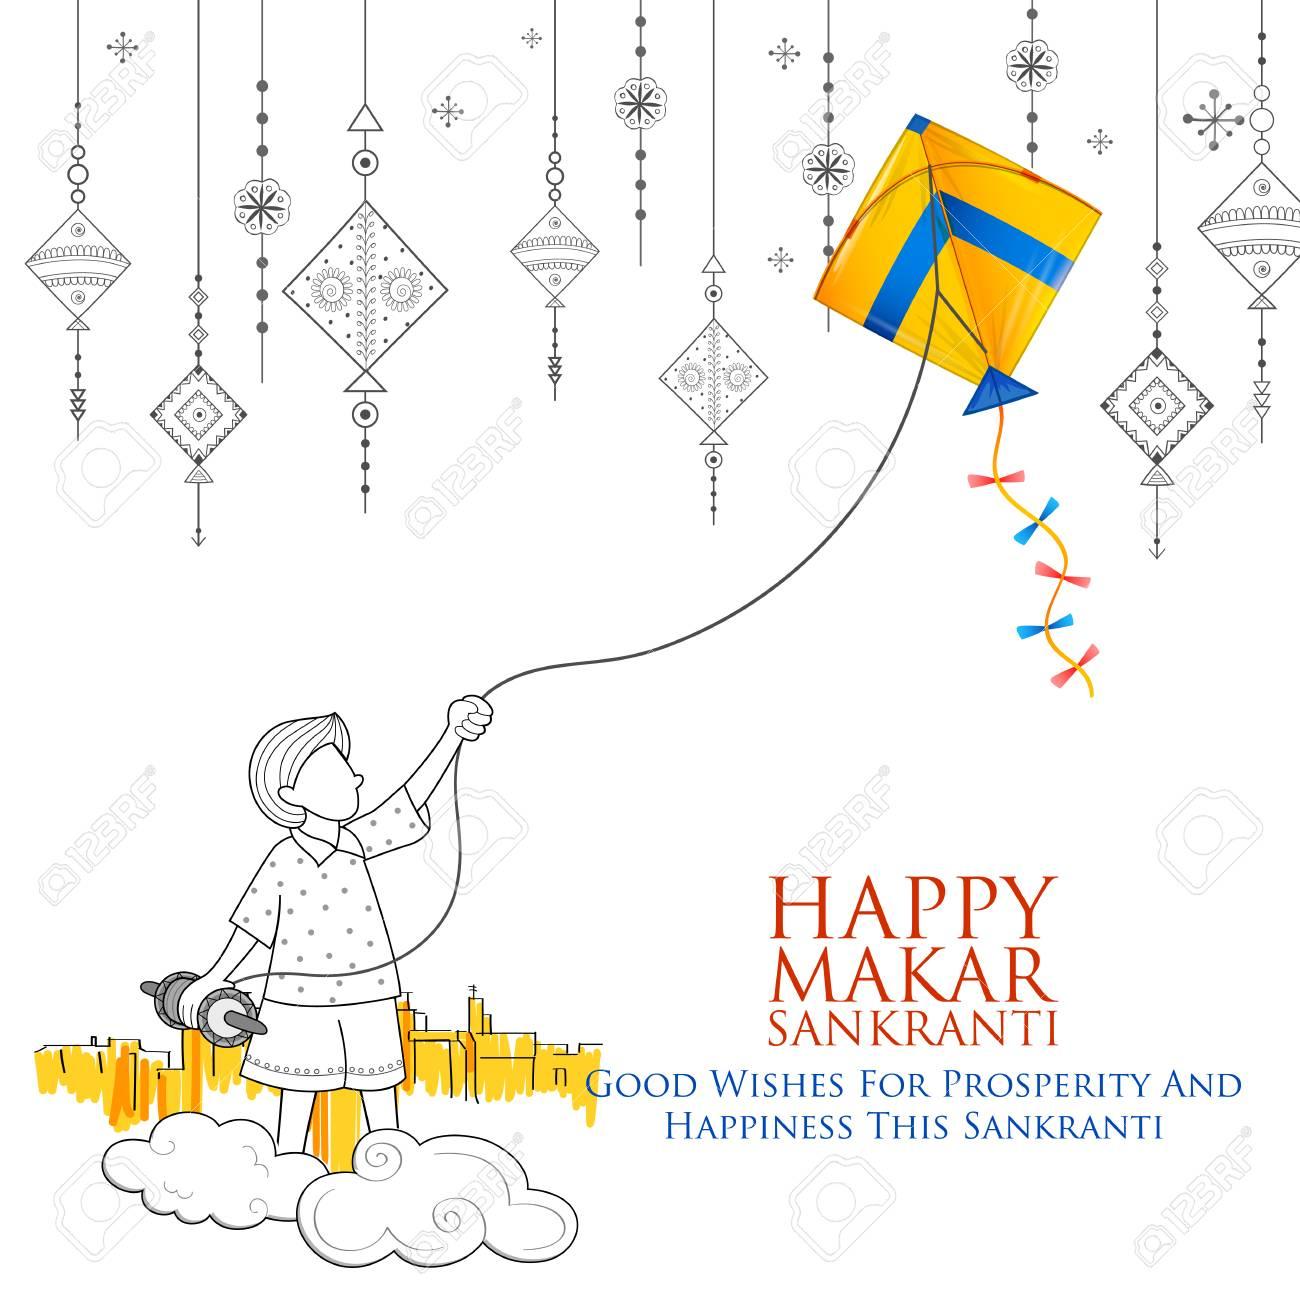 Happy Makar Sankranti wallpaper with colorful kite string for festival of India - 91805153